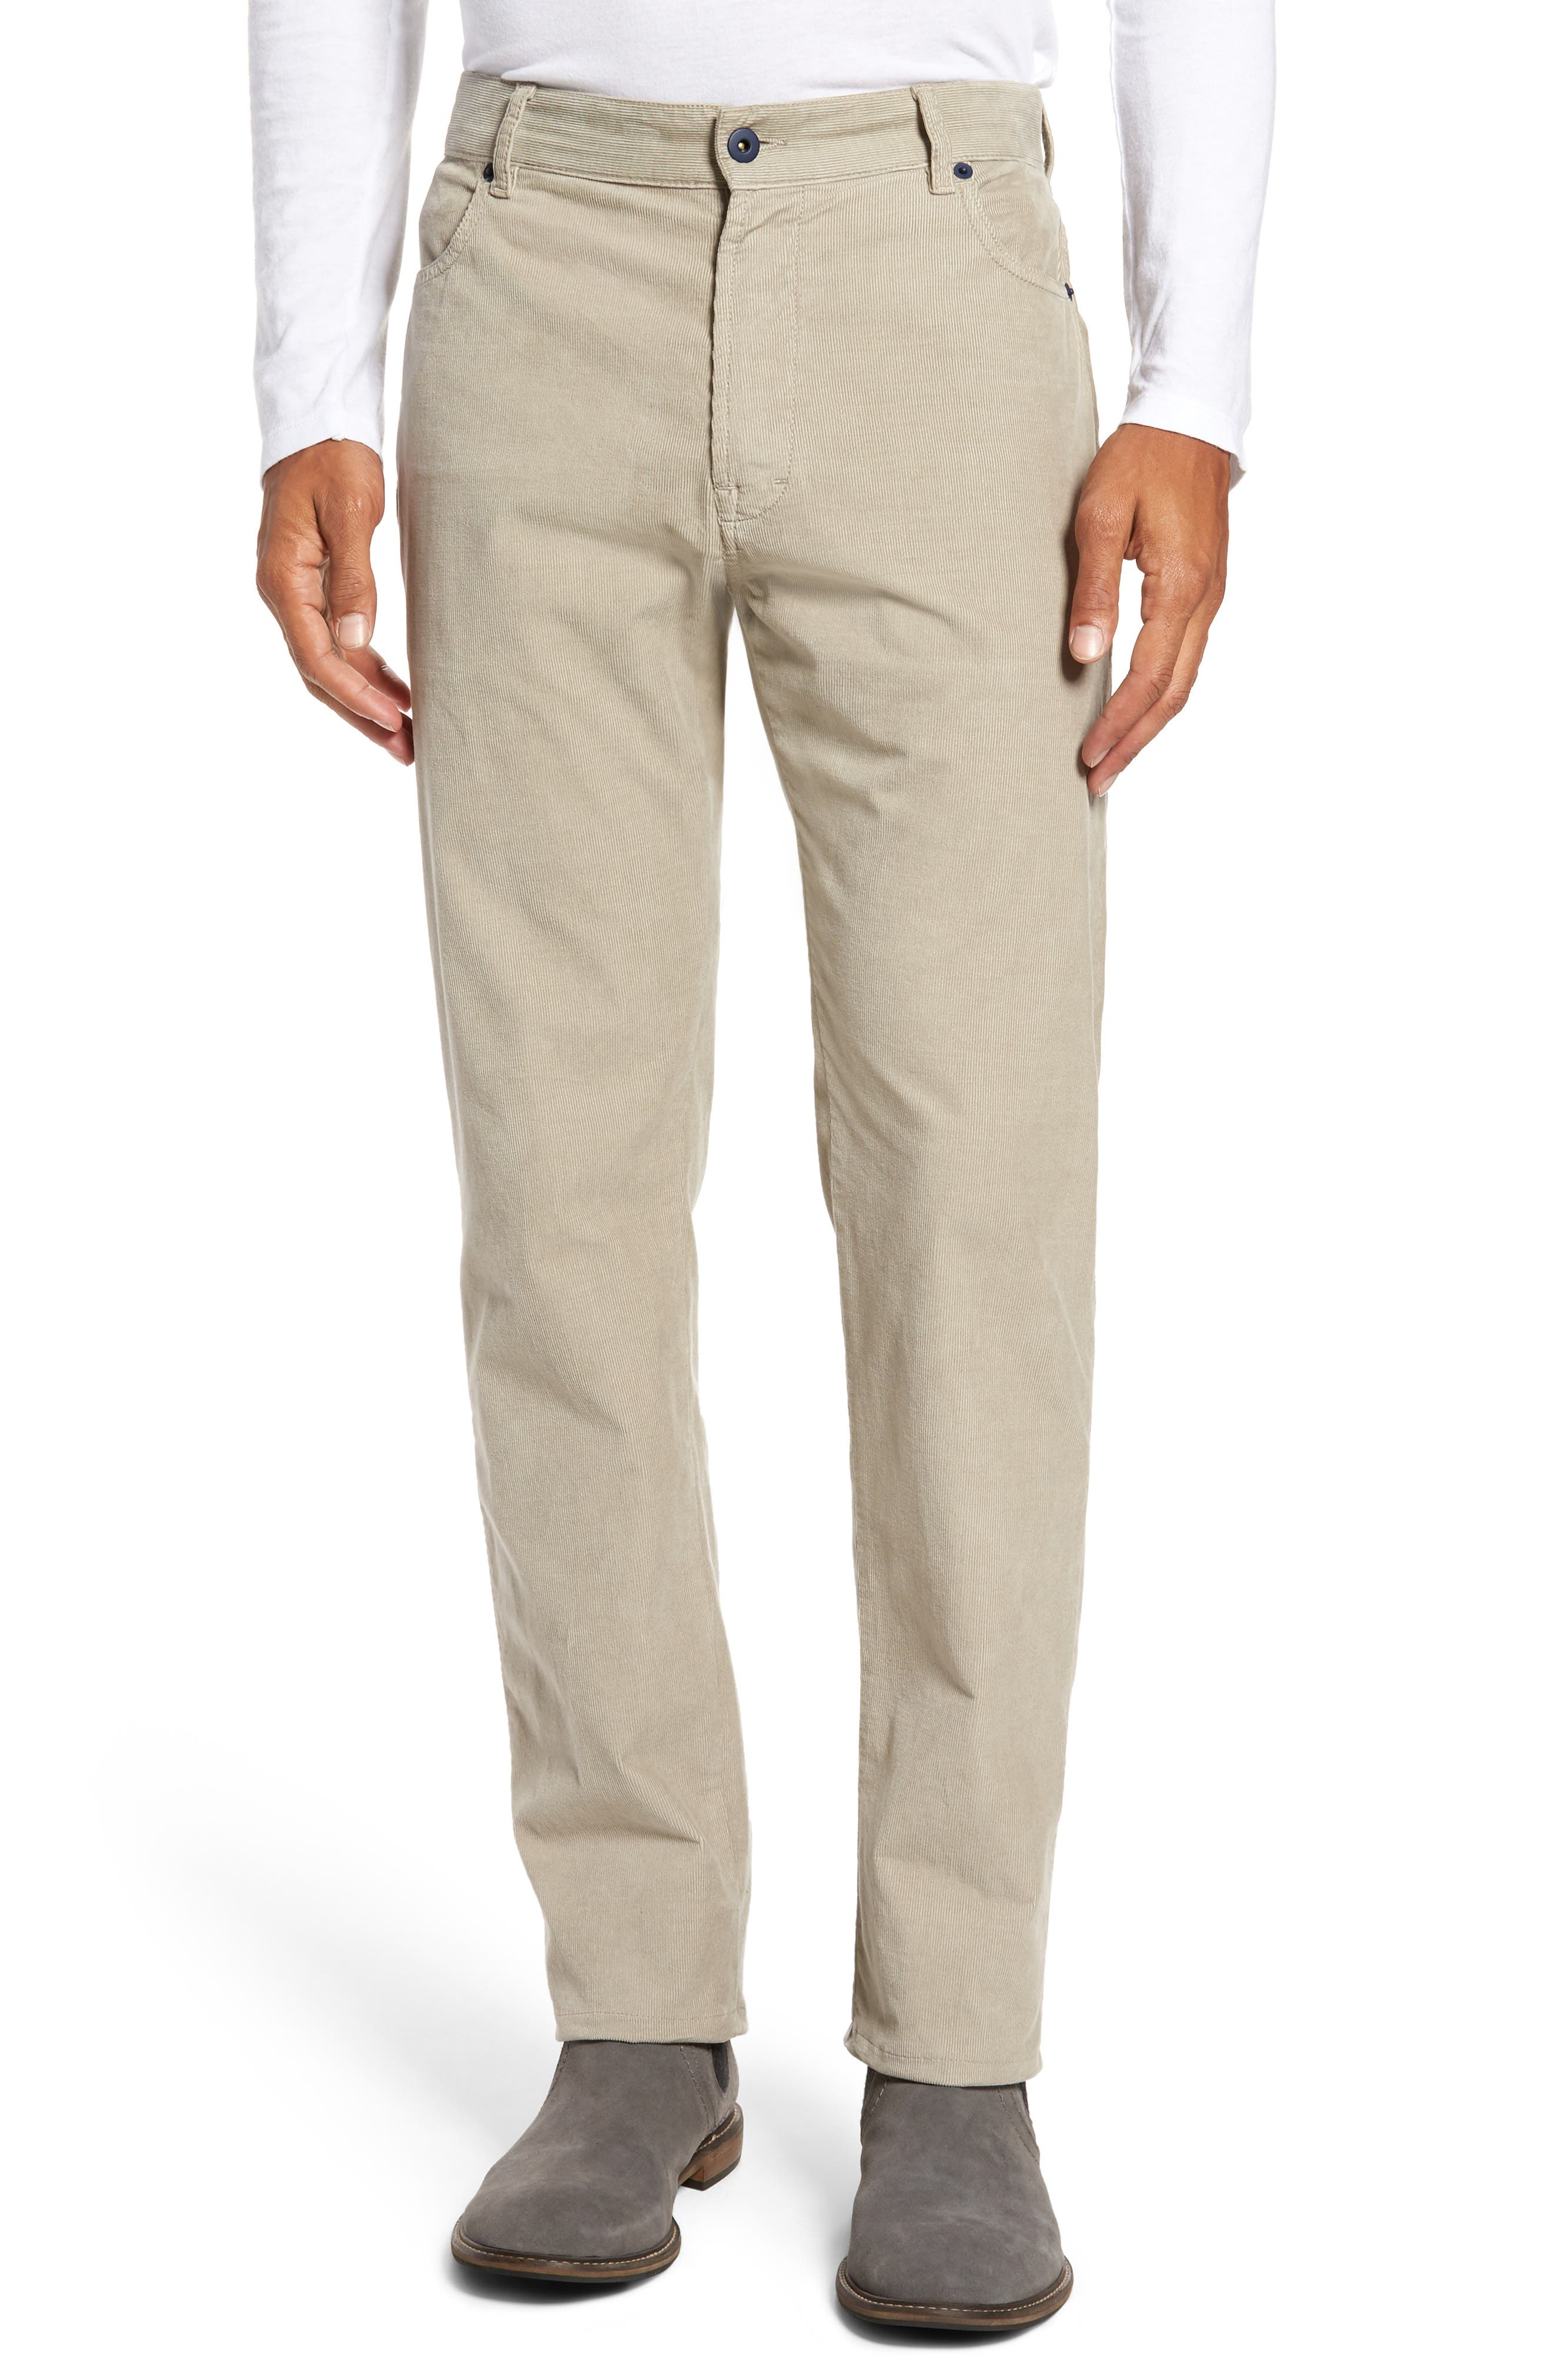 Redonda Stretch Corduroy Trousers,                         Main,                         color, 252